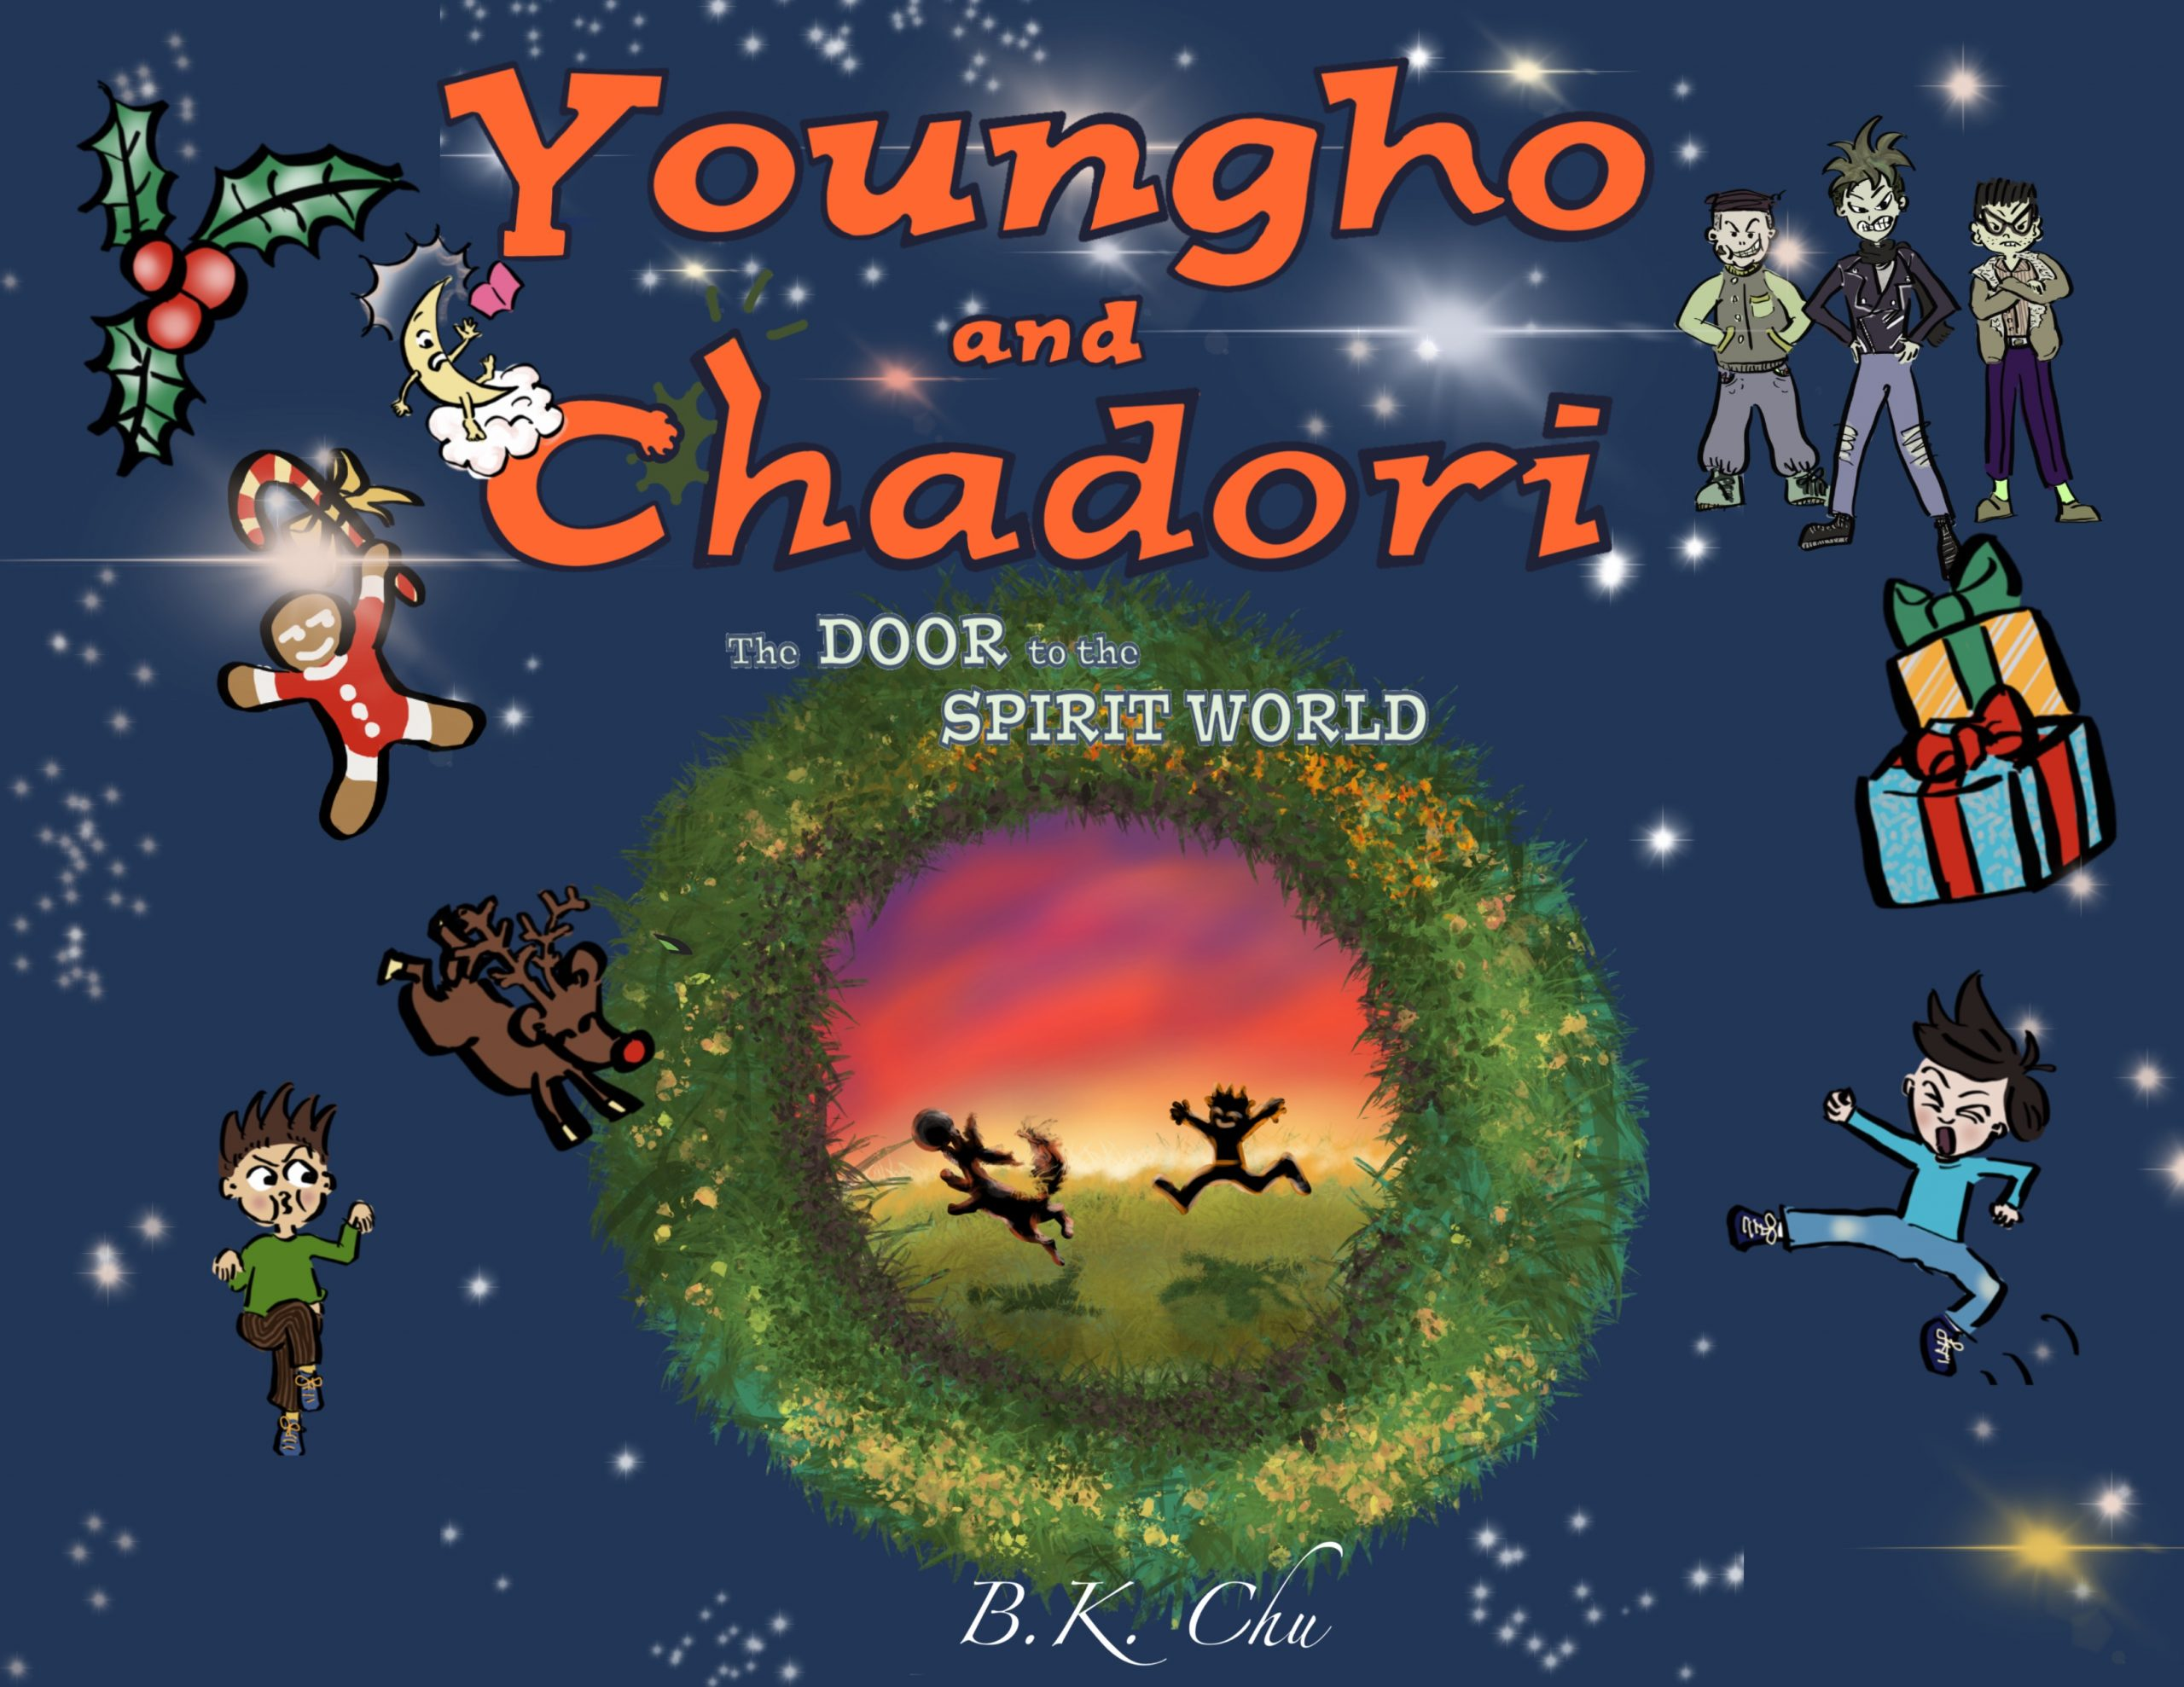 Youngho and Chadori by B.K. Chu